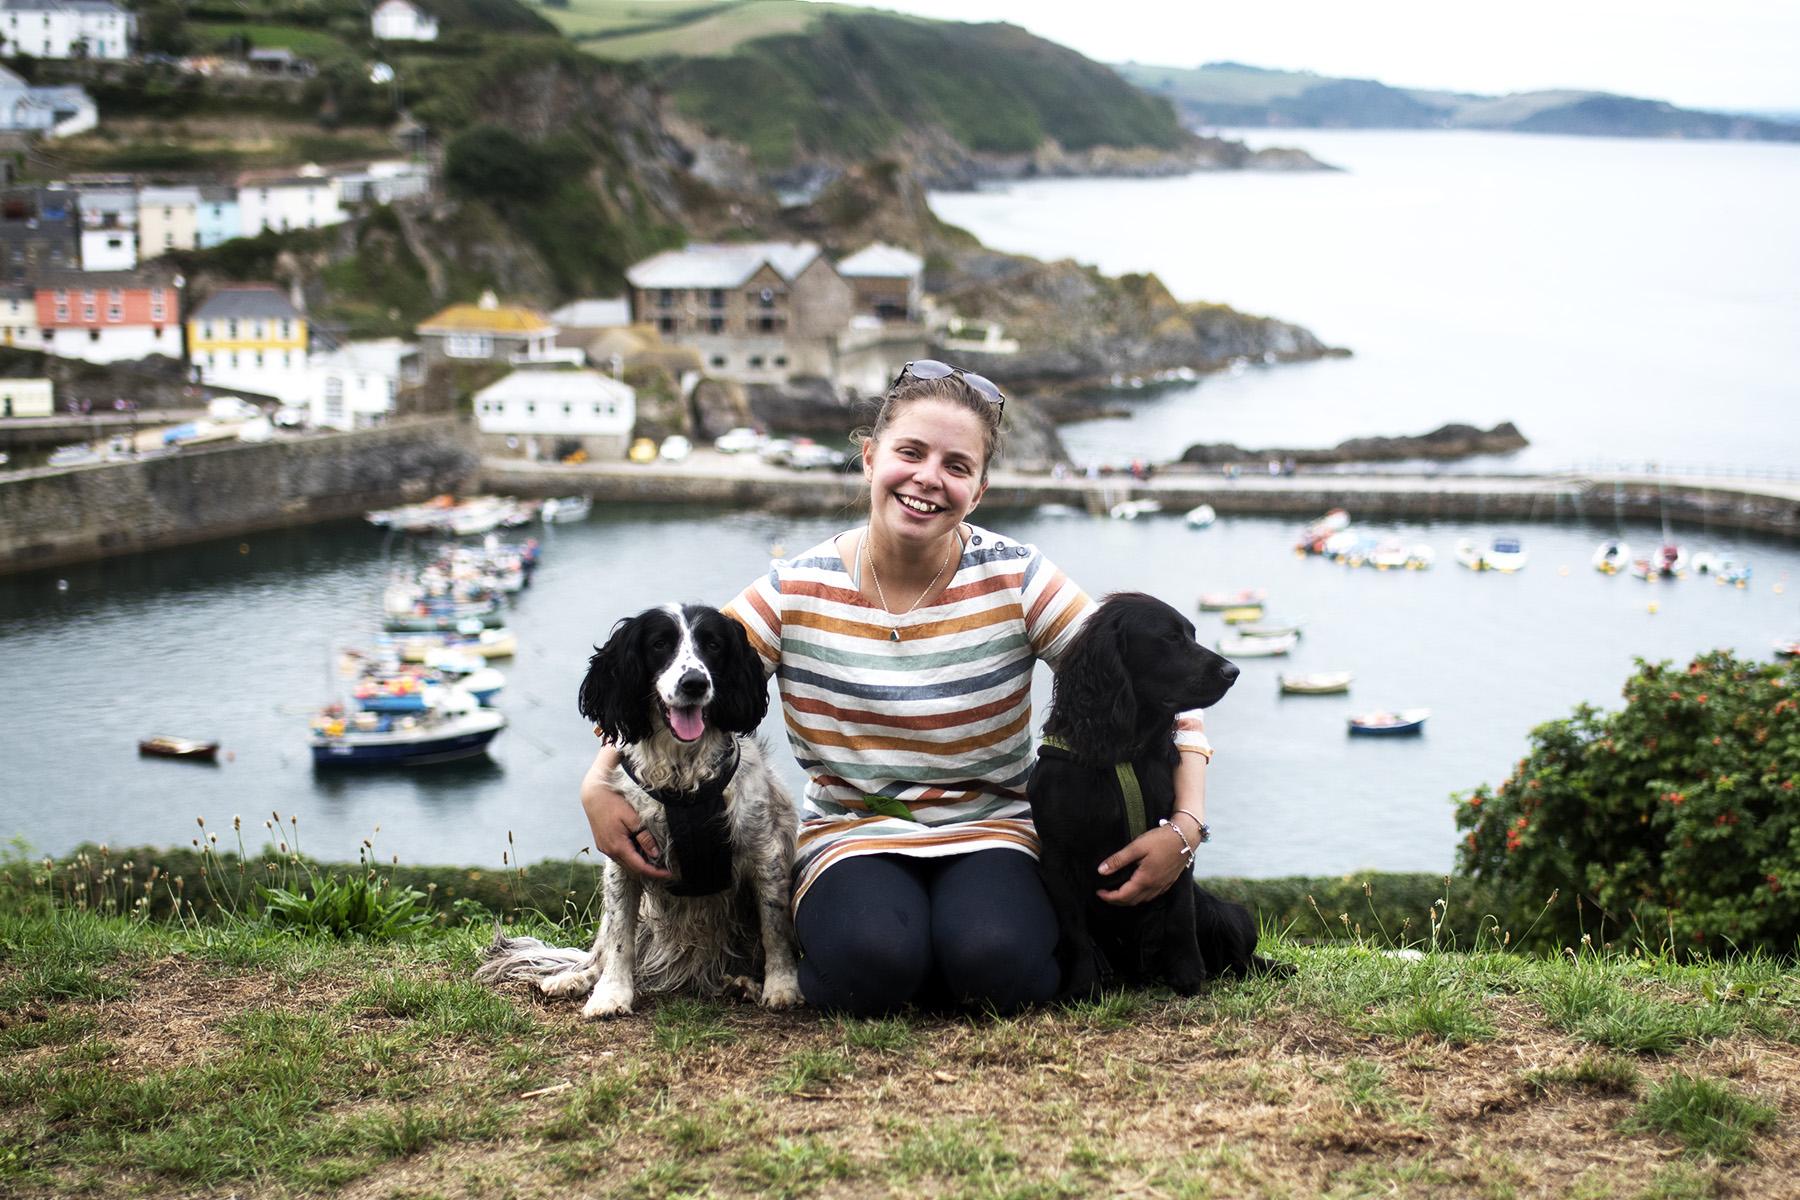 Hattie | The Cornish Dog